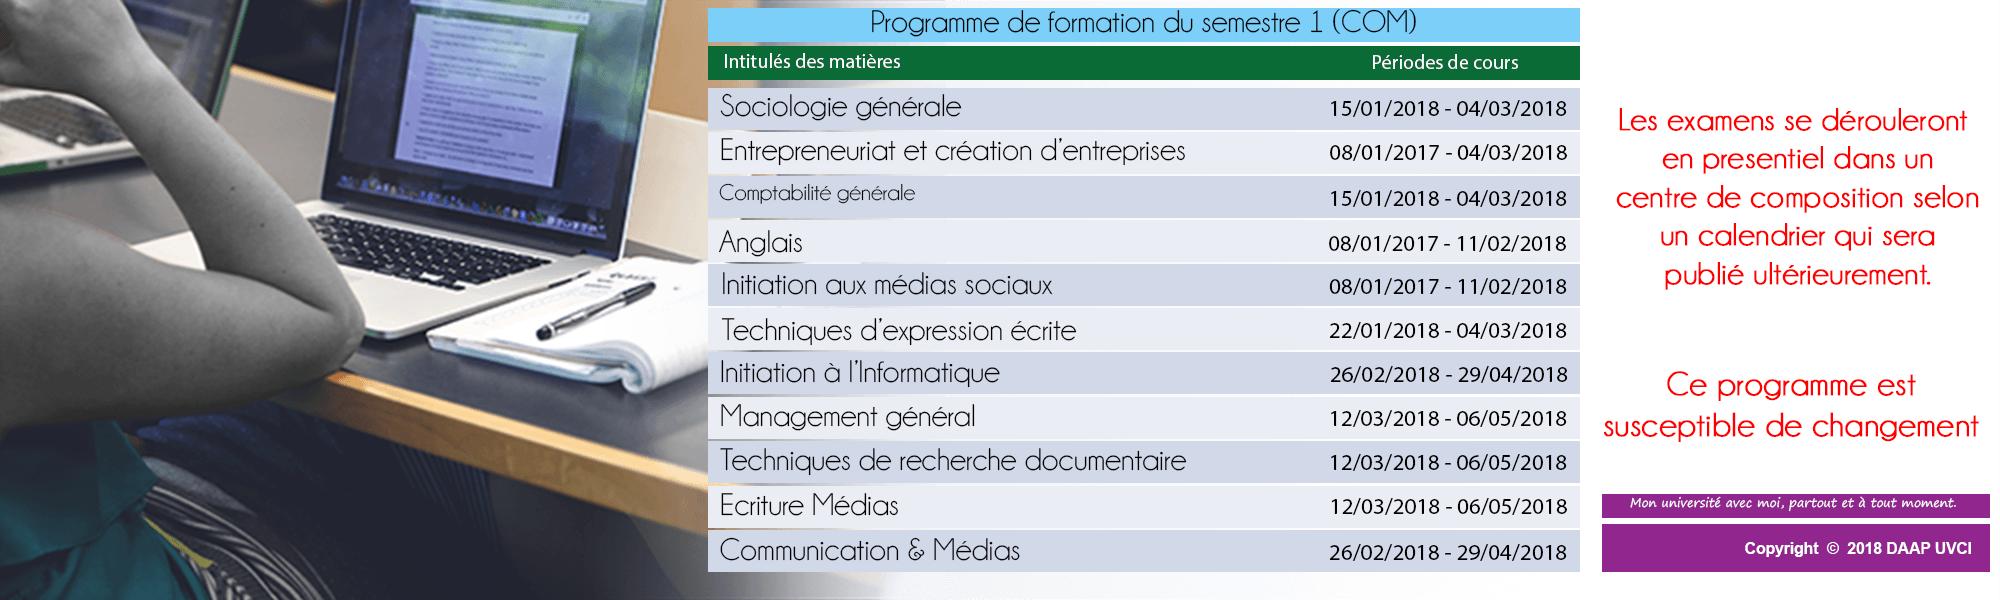 PROGRAMME DE FORMATION DU SEMESTRE 1 - COM